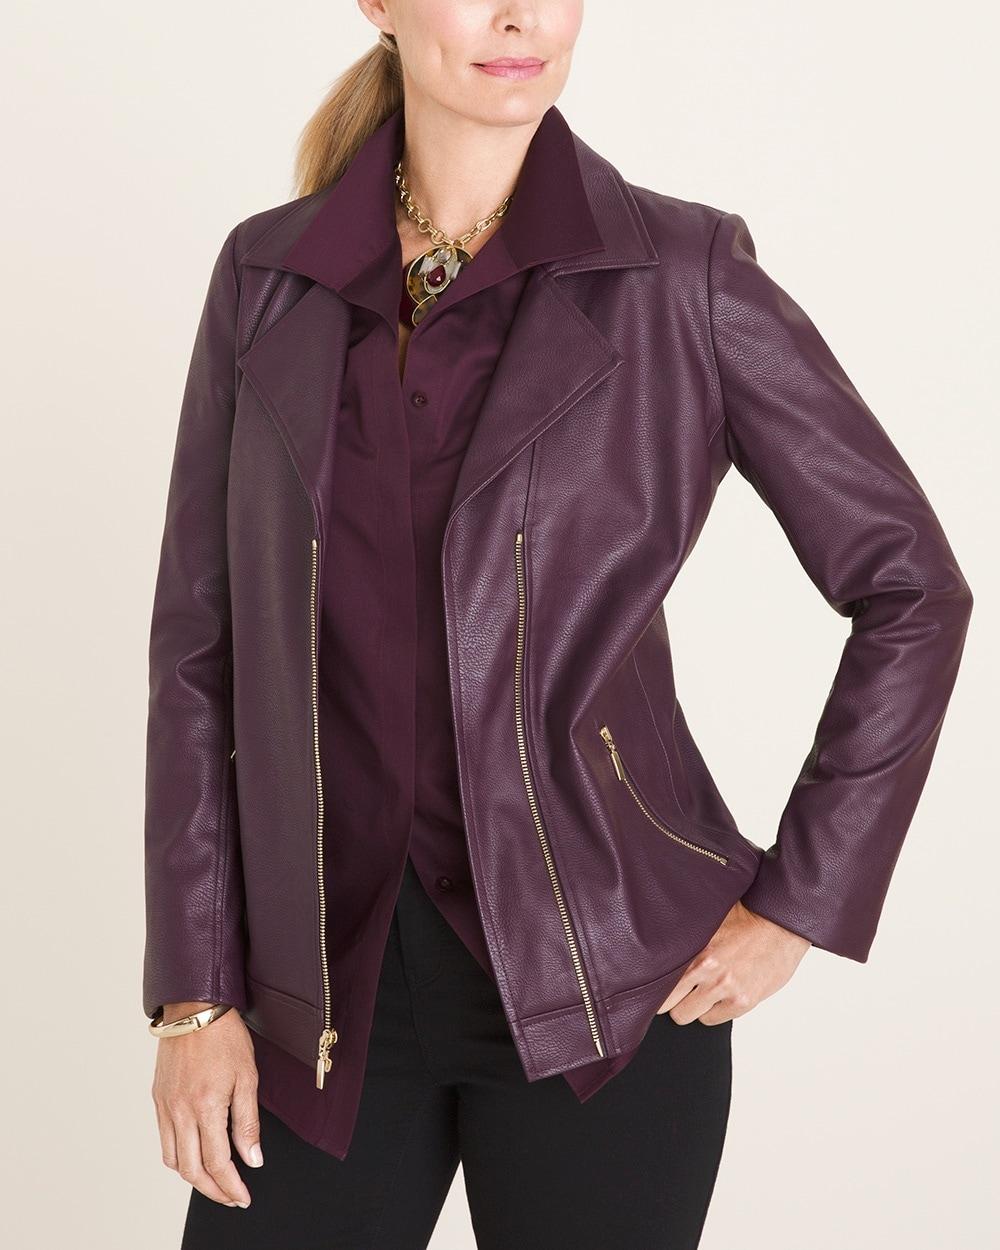 rock-bottom price find workmanship shop best sellers Faux-Leather Moto Jacket